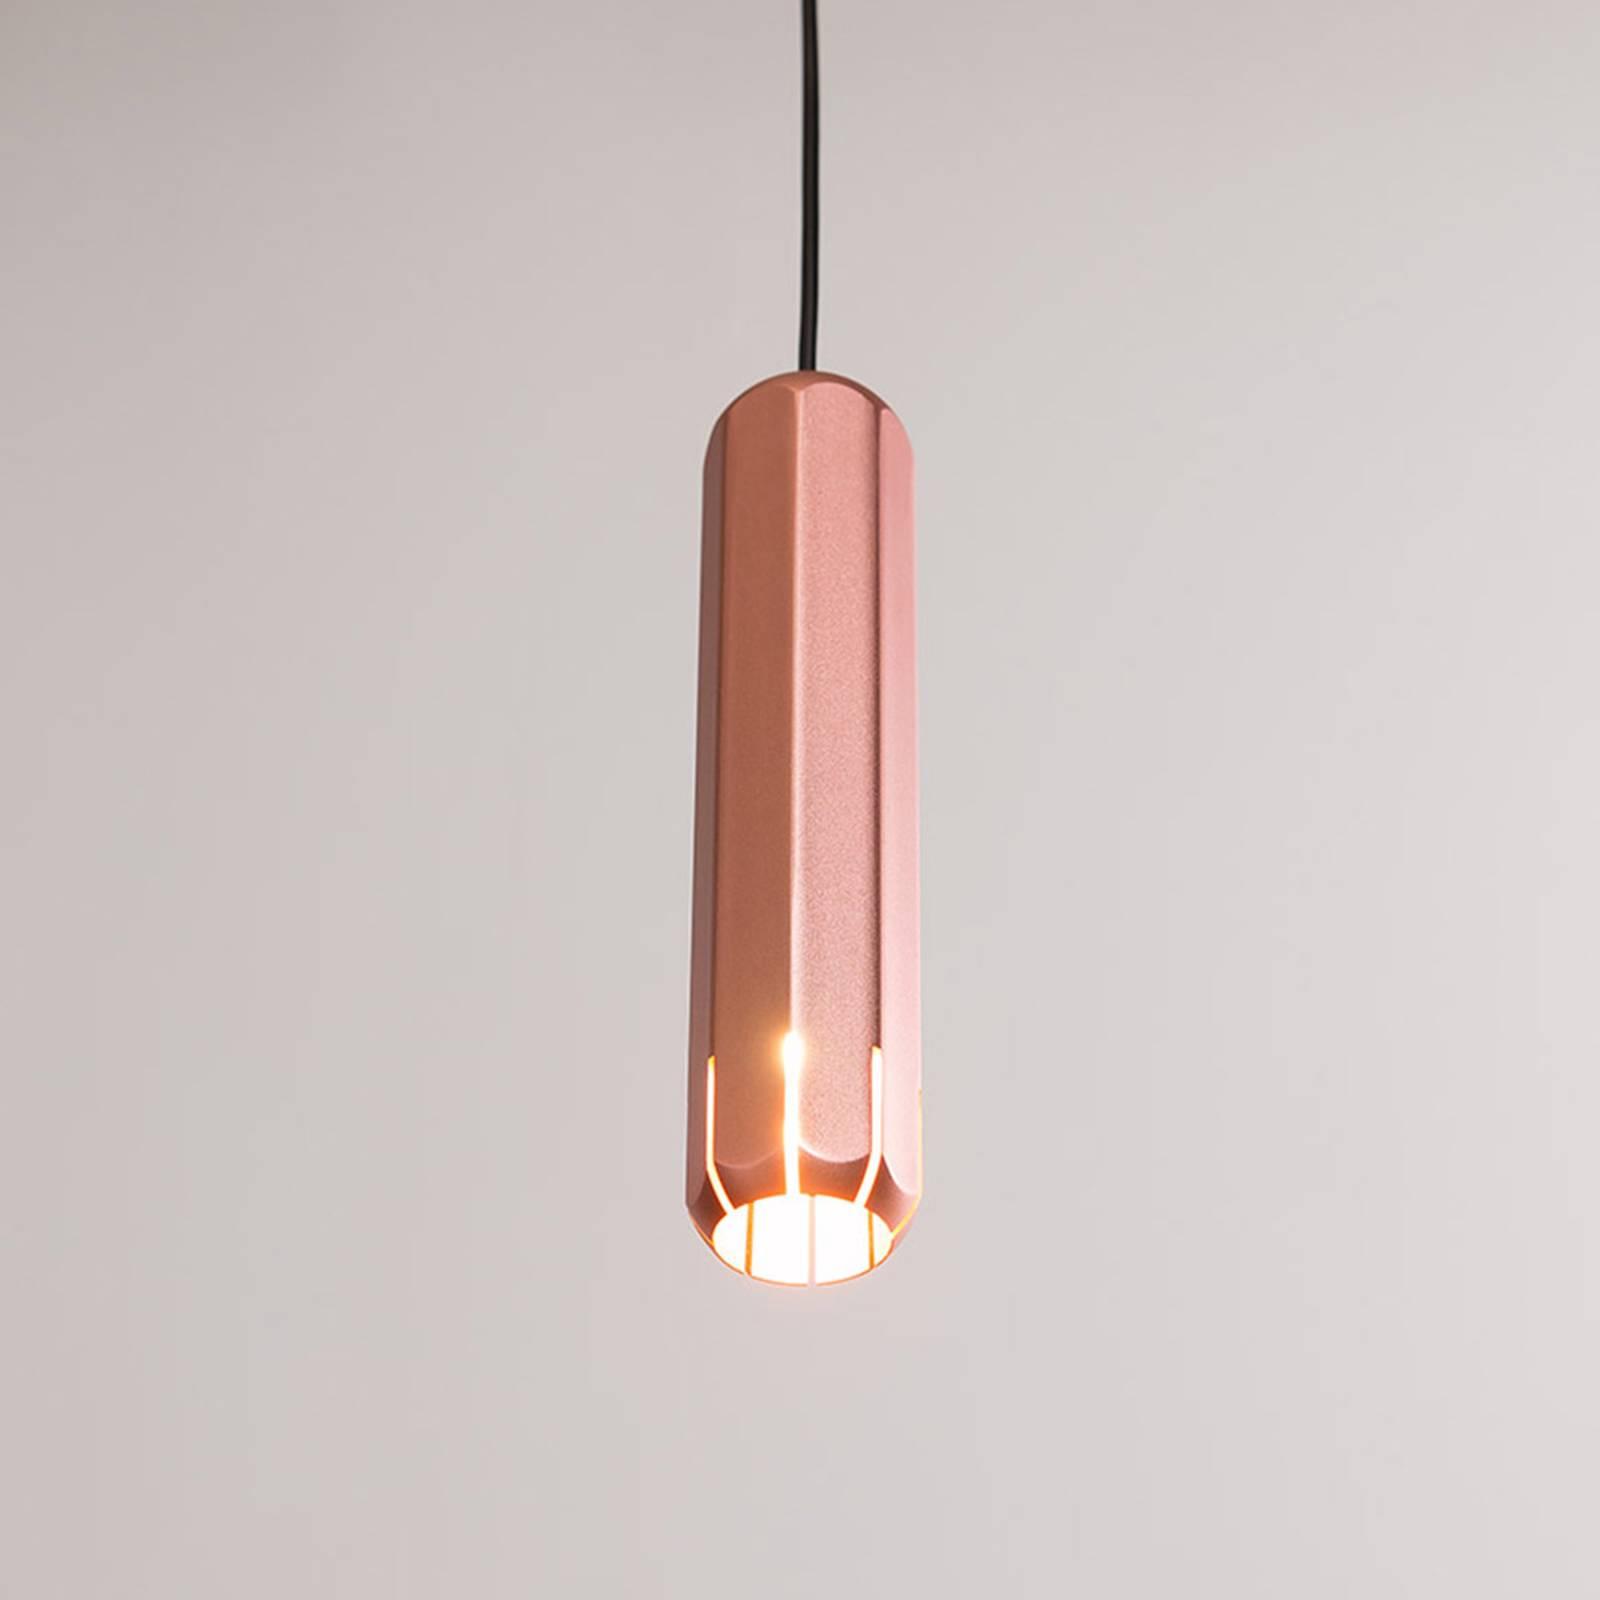 Innermost Brixton spot 20 LED hanglamp koper